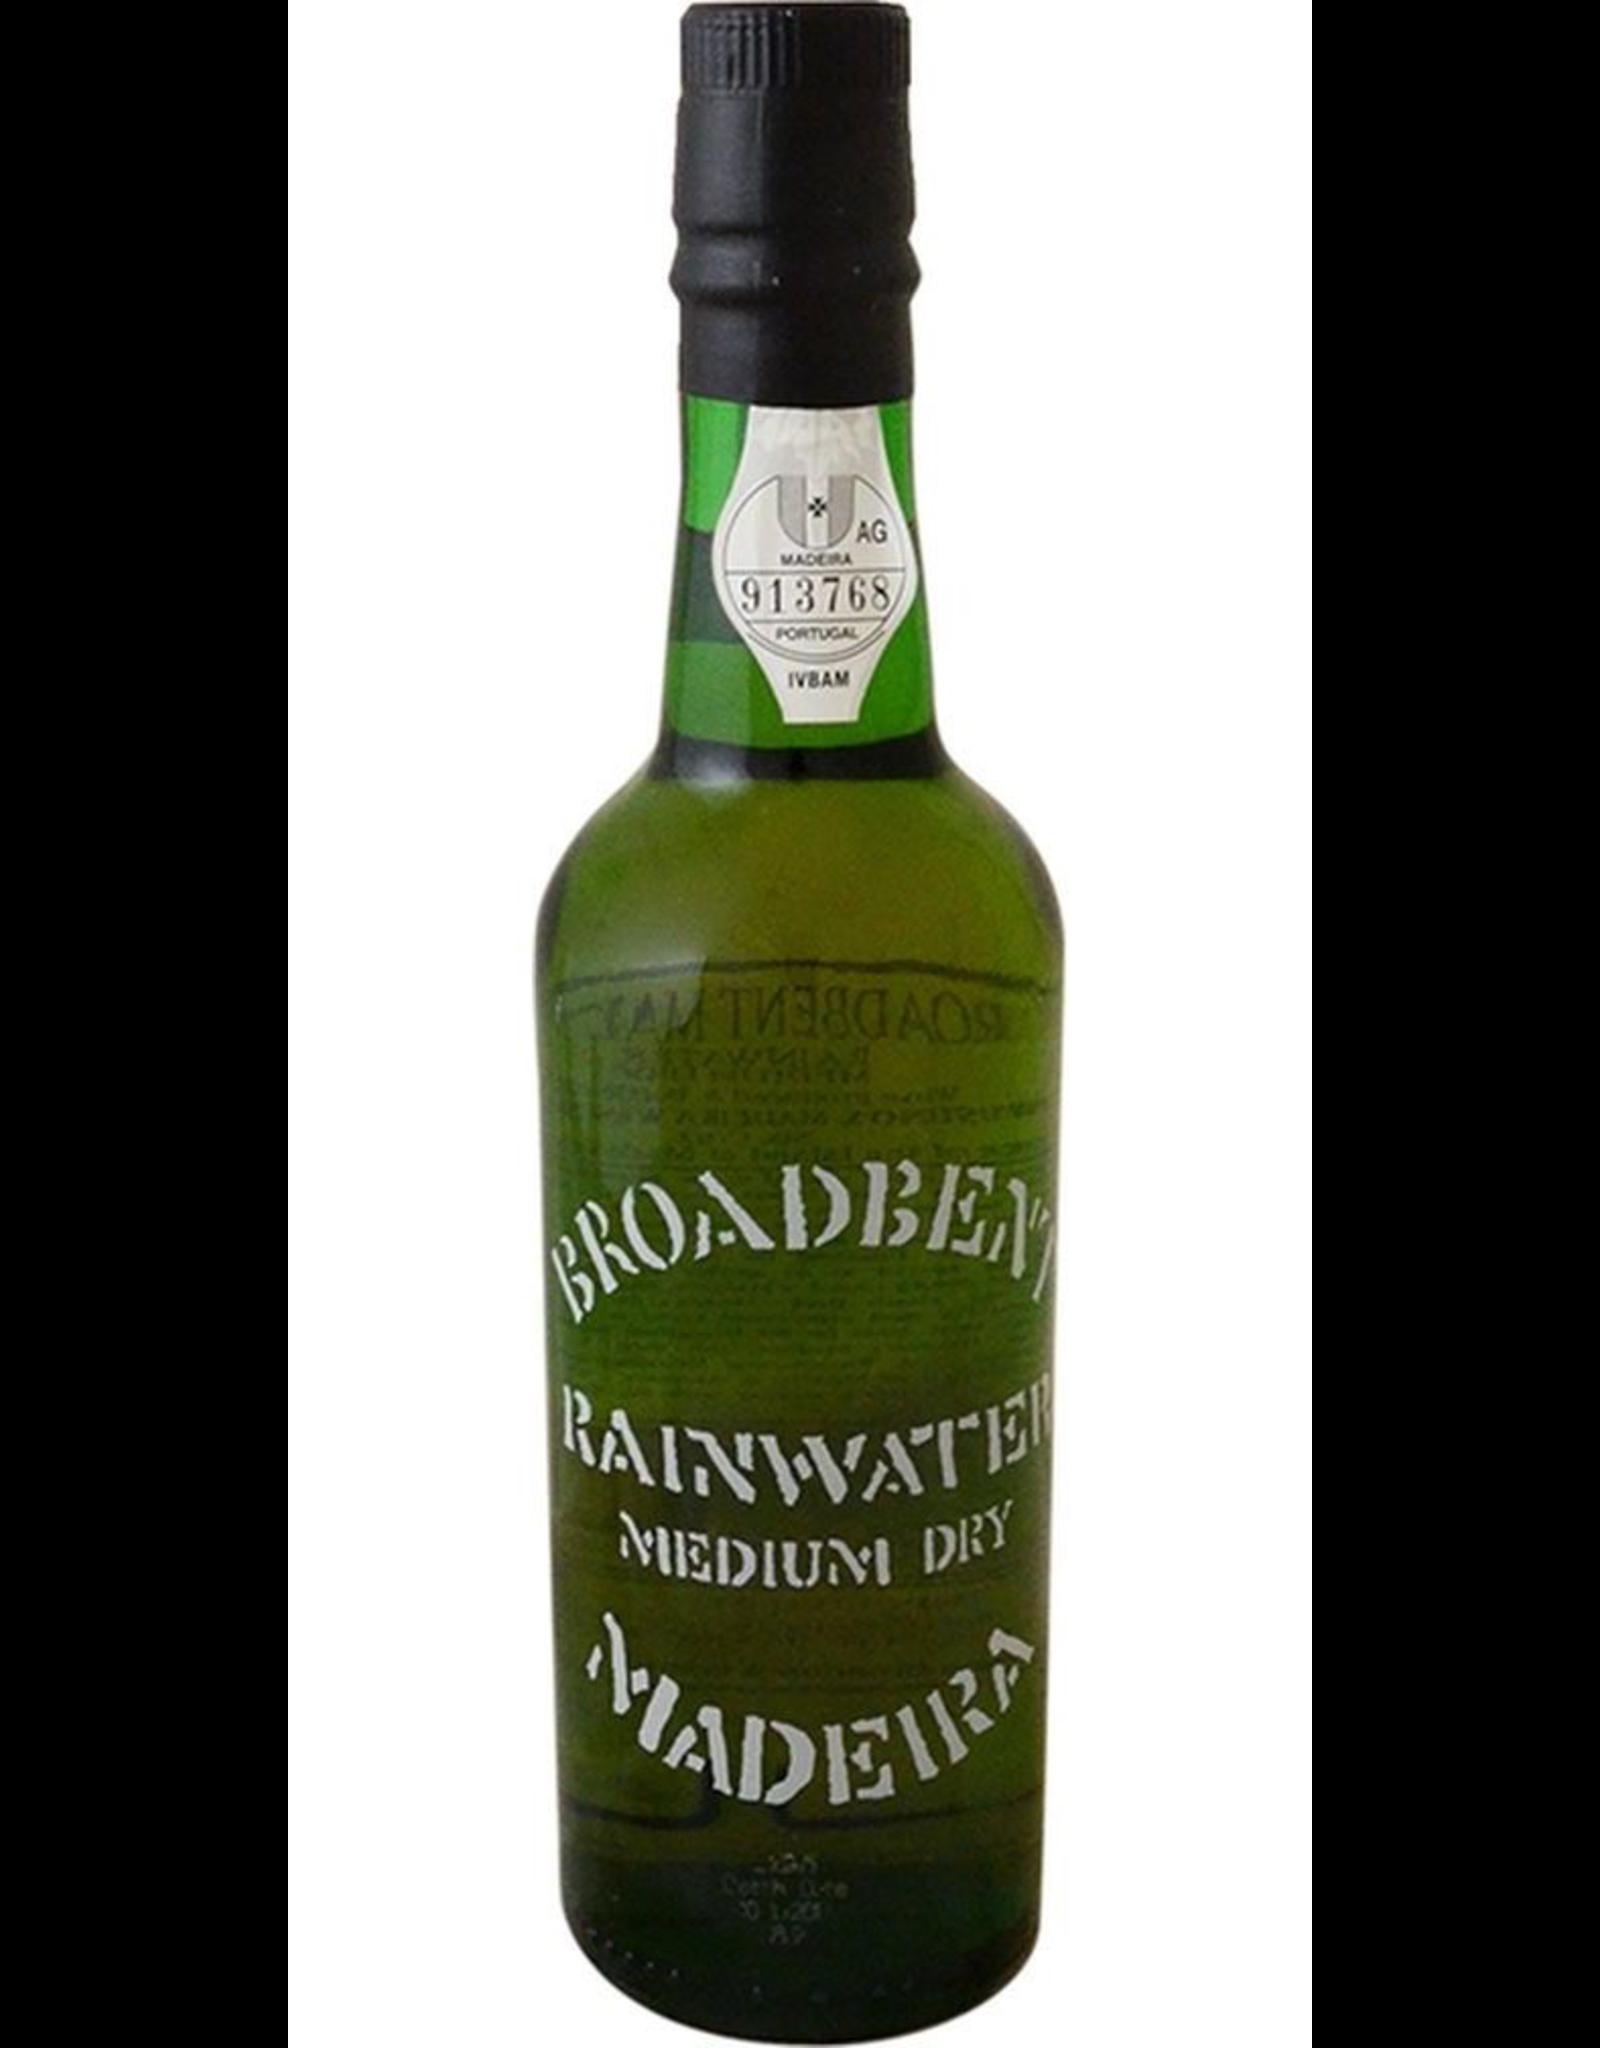 Desert Wine NV, Broadbent Rainwater Med Dry, Malmsey, Sta. Cruz, Madeira, Portugal, 19% Alc, CT88, RP90